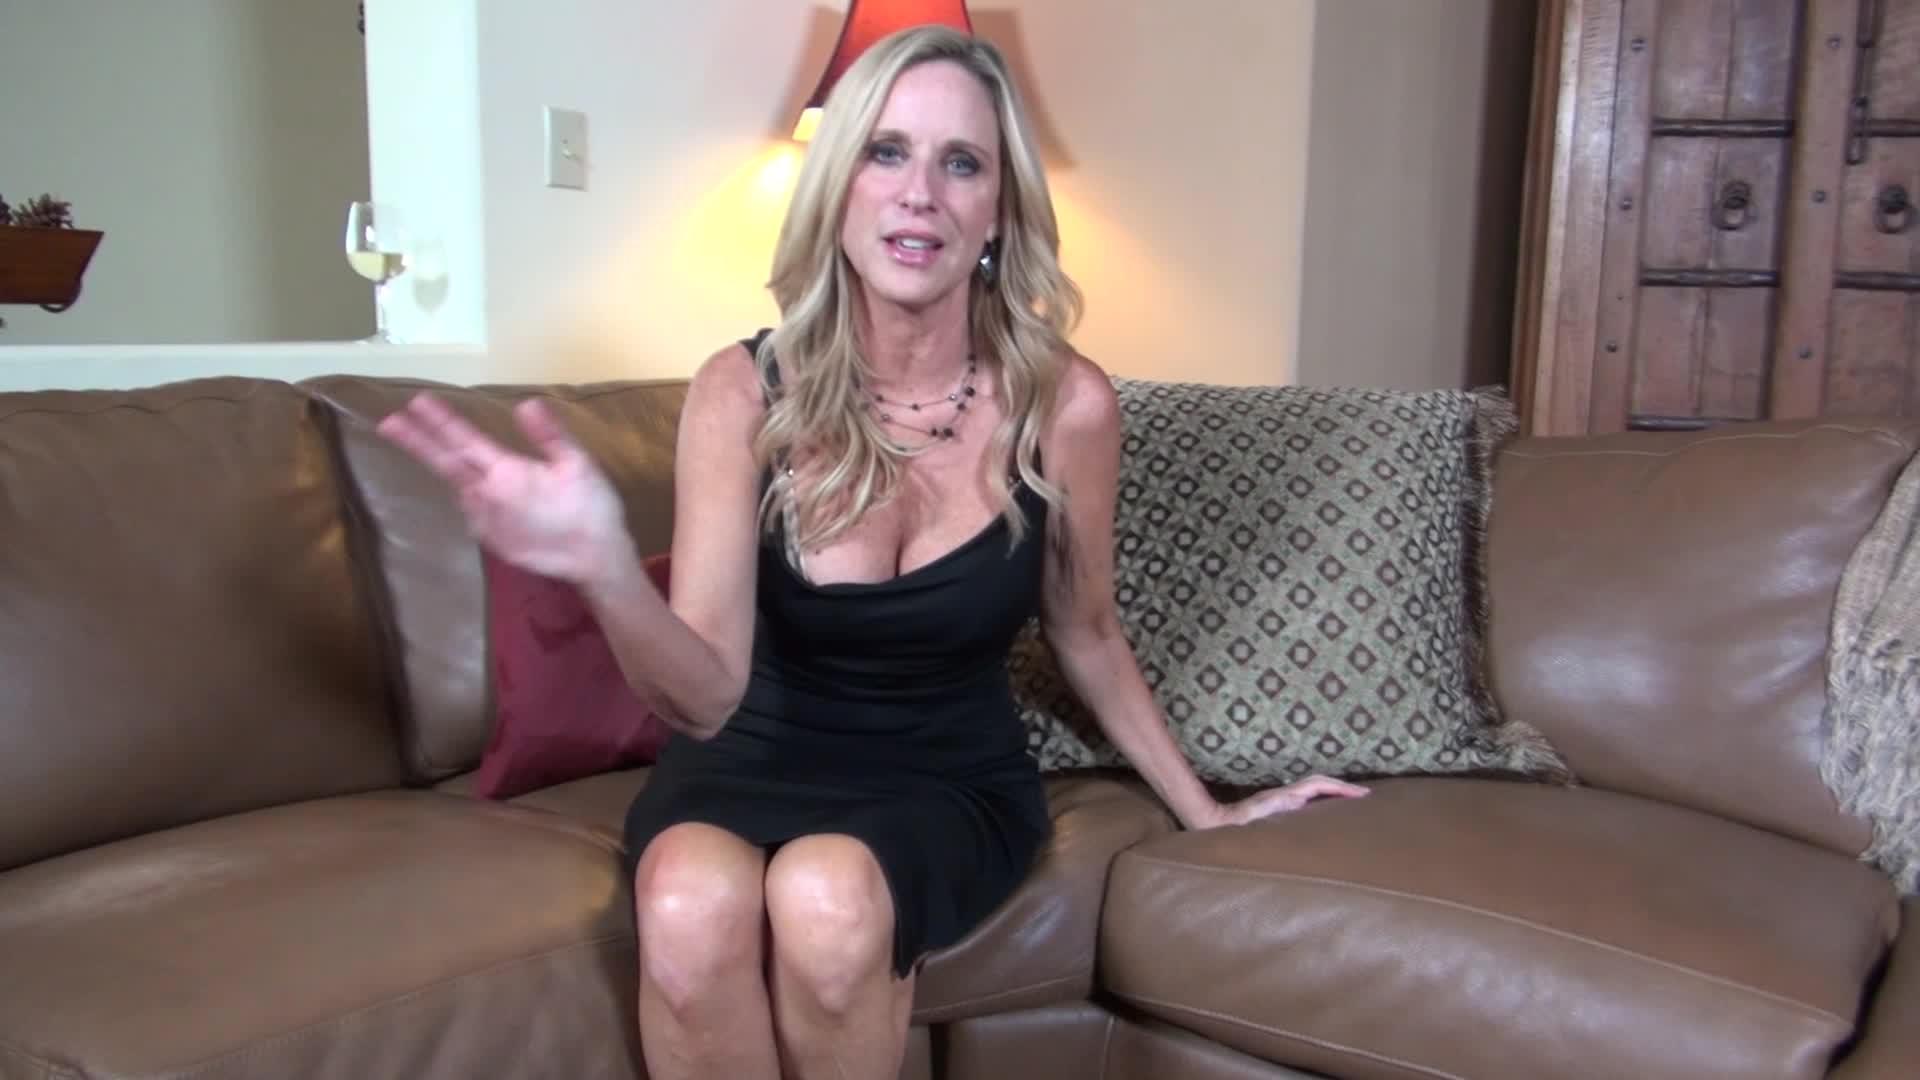 Tits free jodi west videos while fuck.. classy